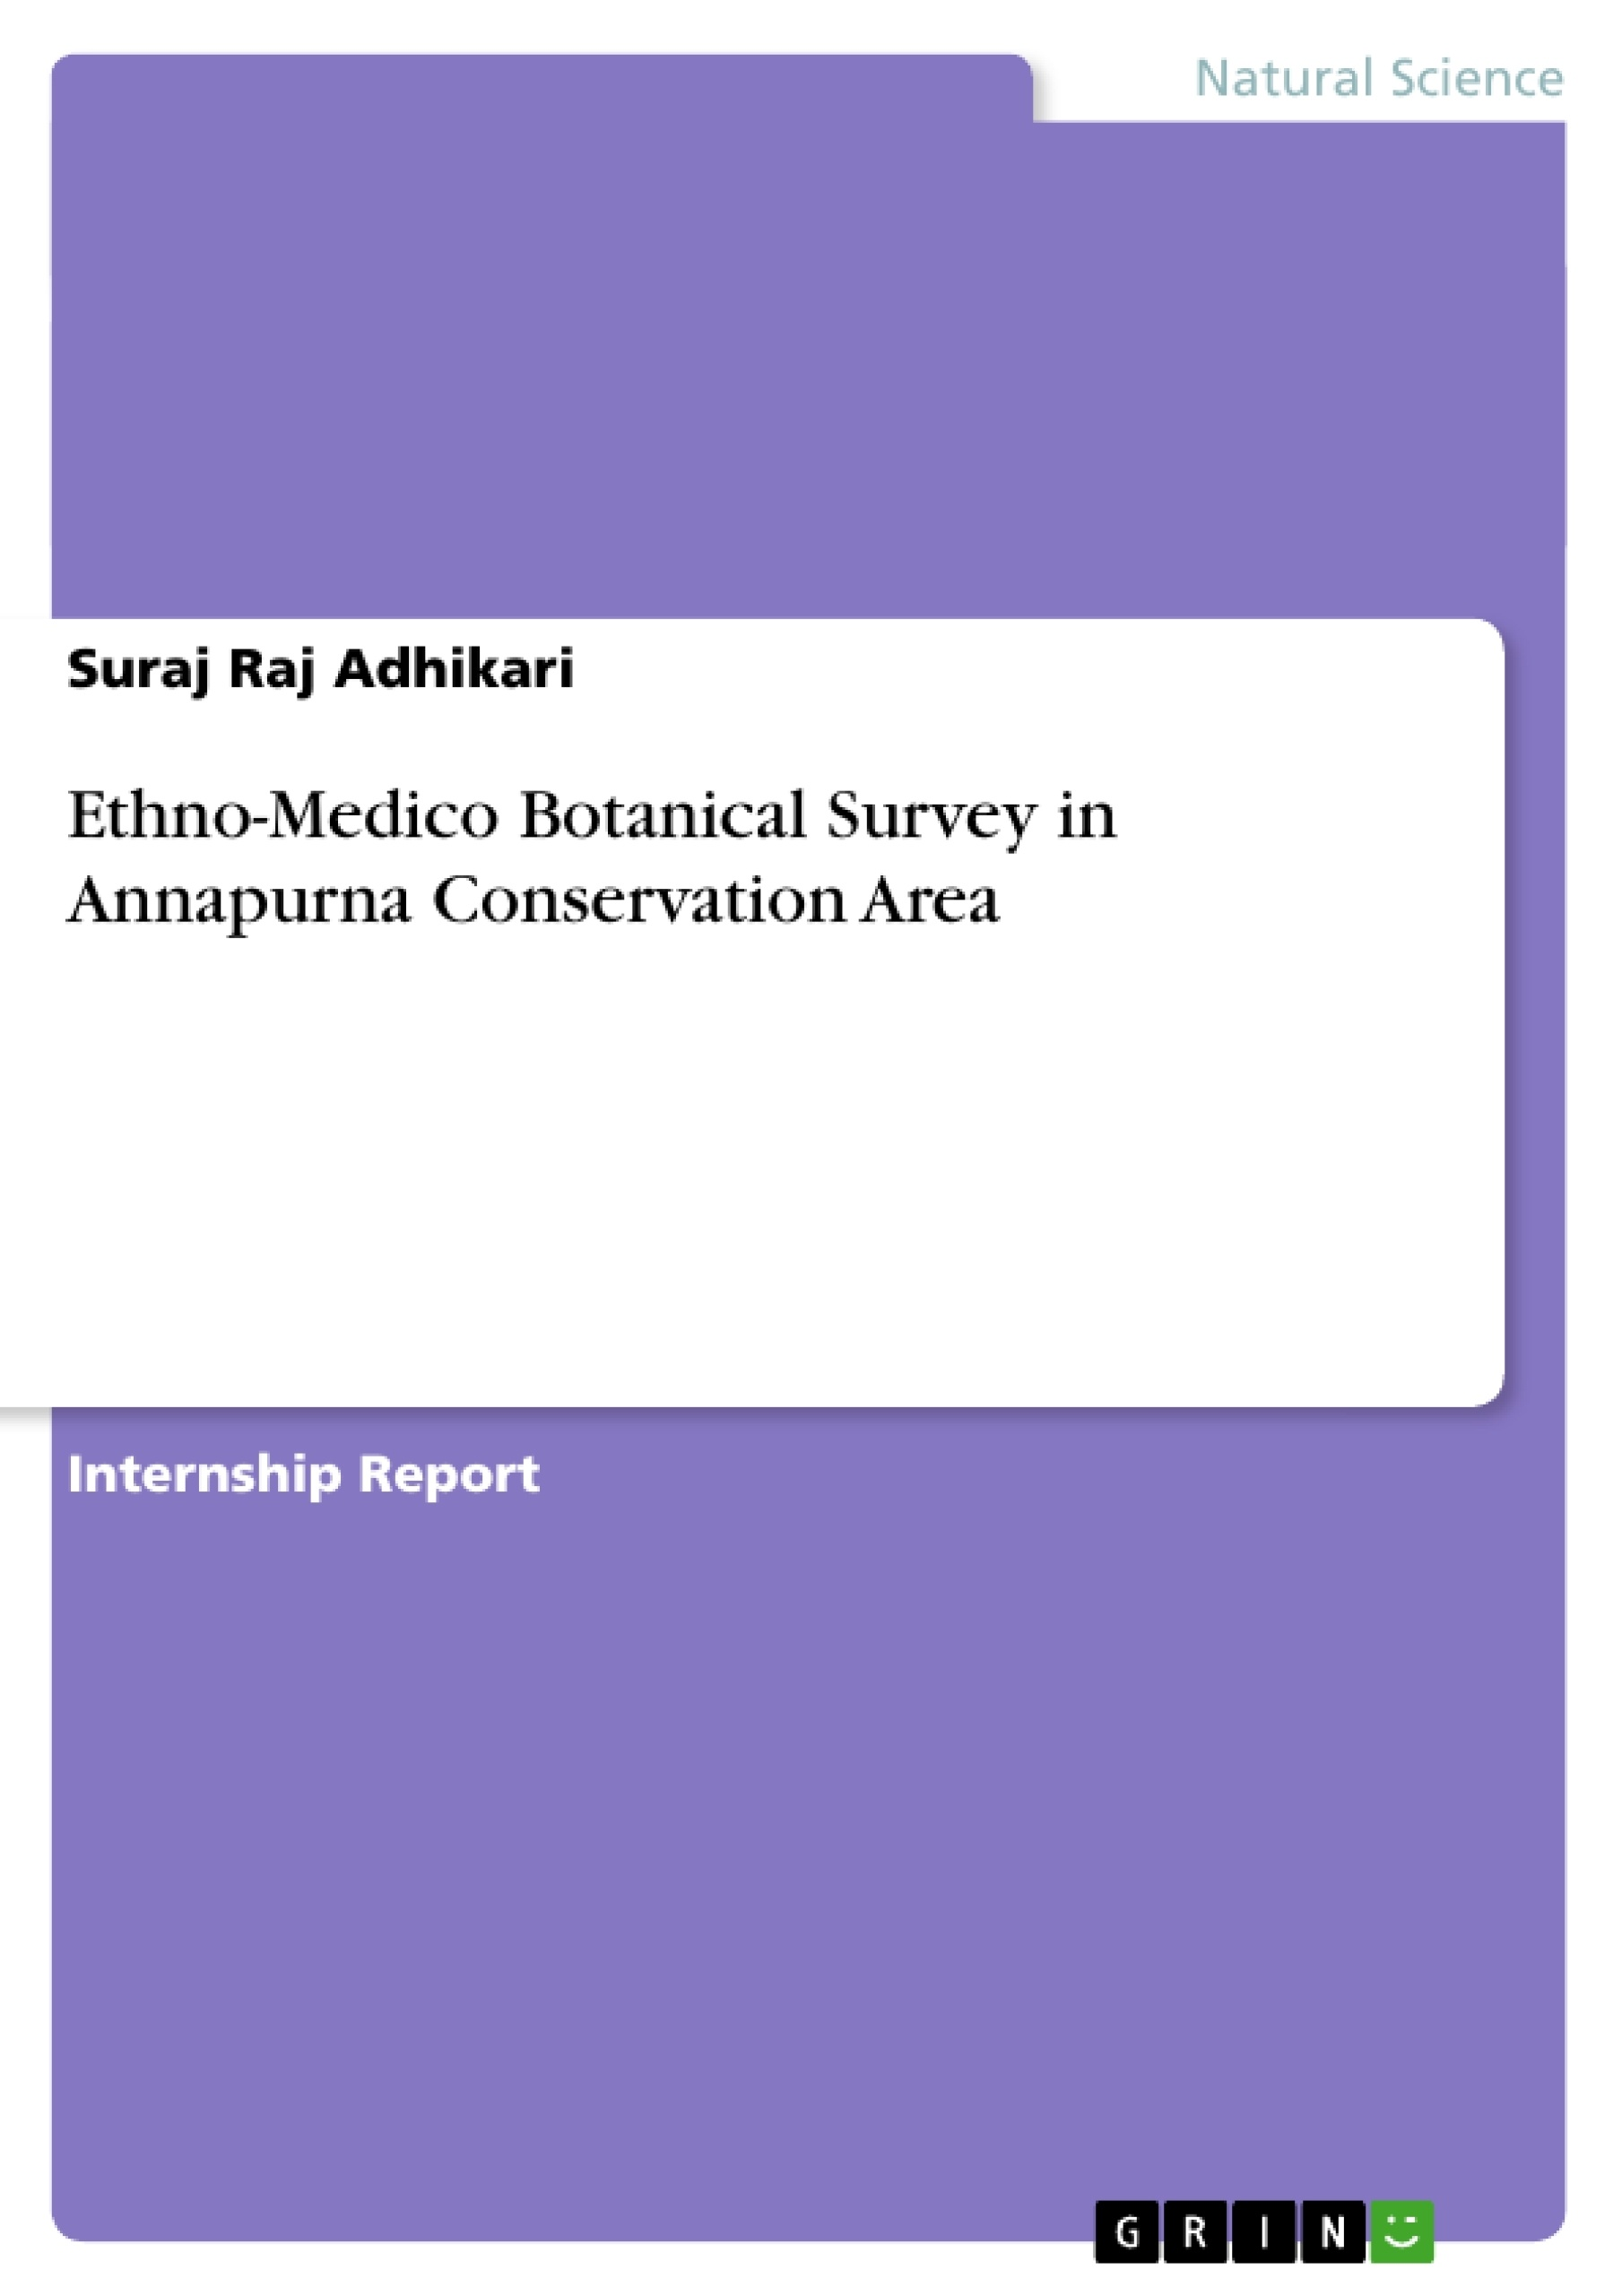 Title: Ethno-Medico Botanical Survey in Annapurna Conservation Area